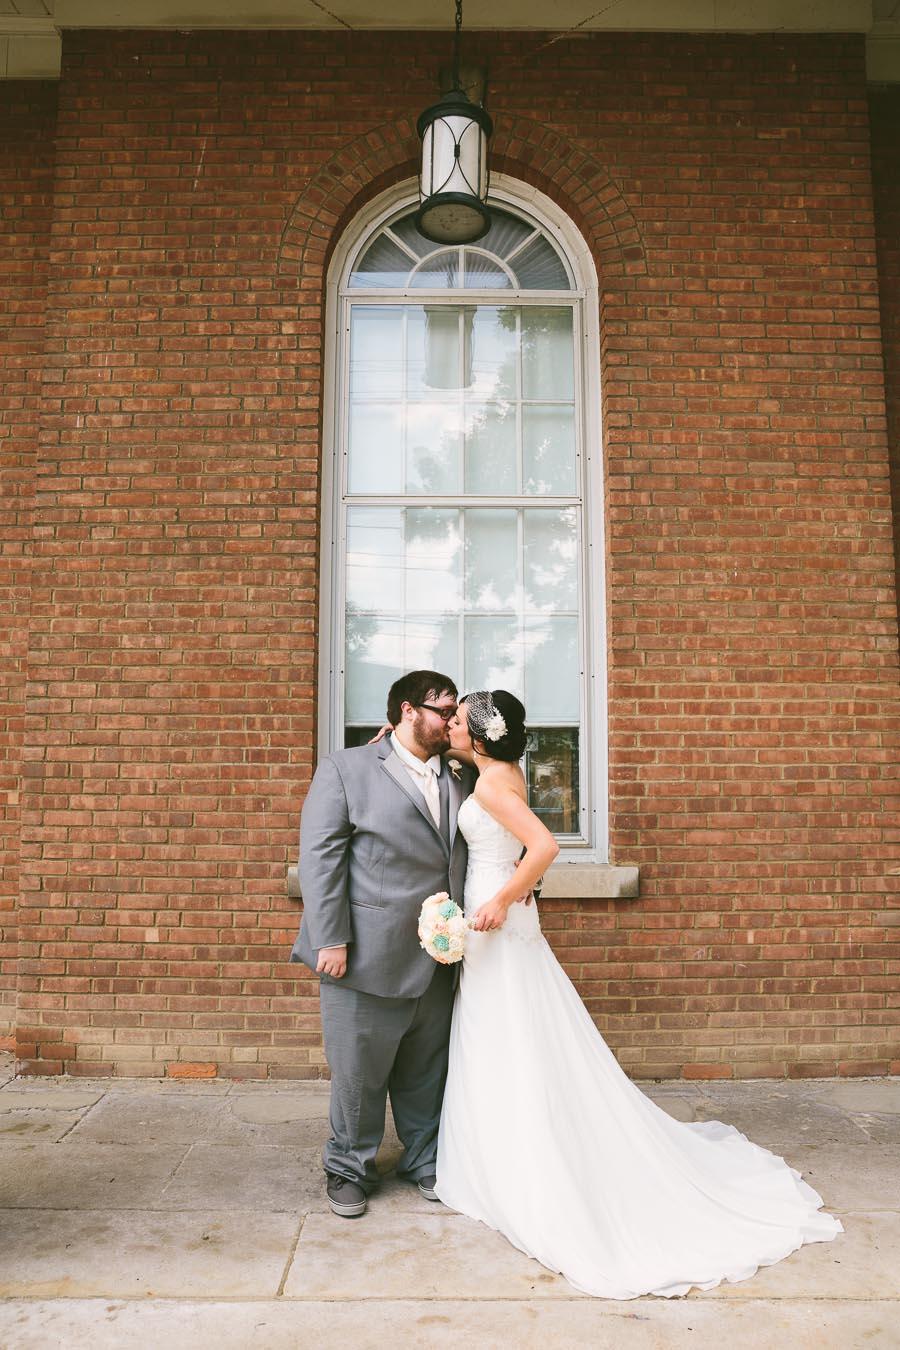 north-olmstead-wedding-photography-at-rubys-grafton-100.jpg